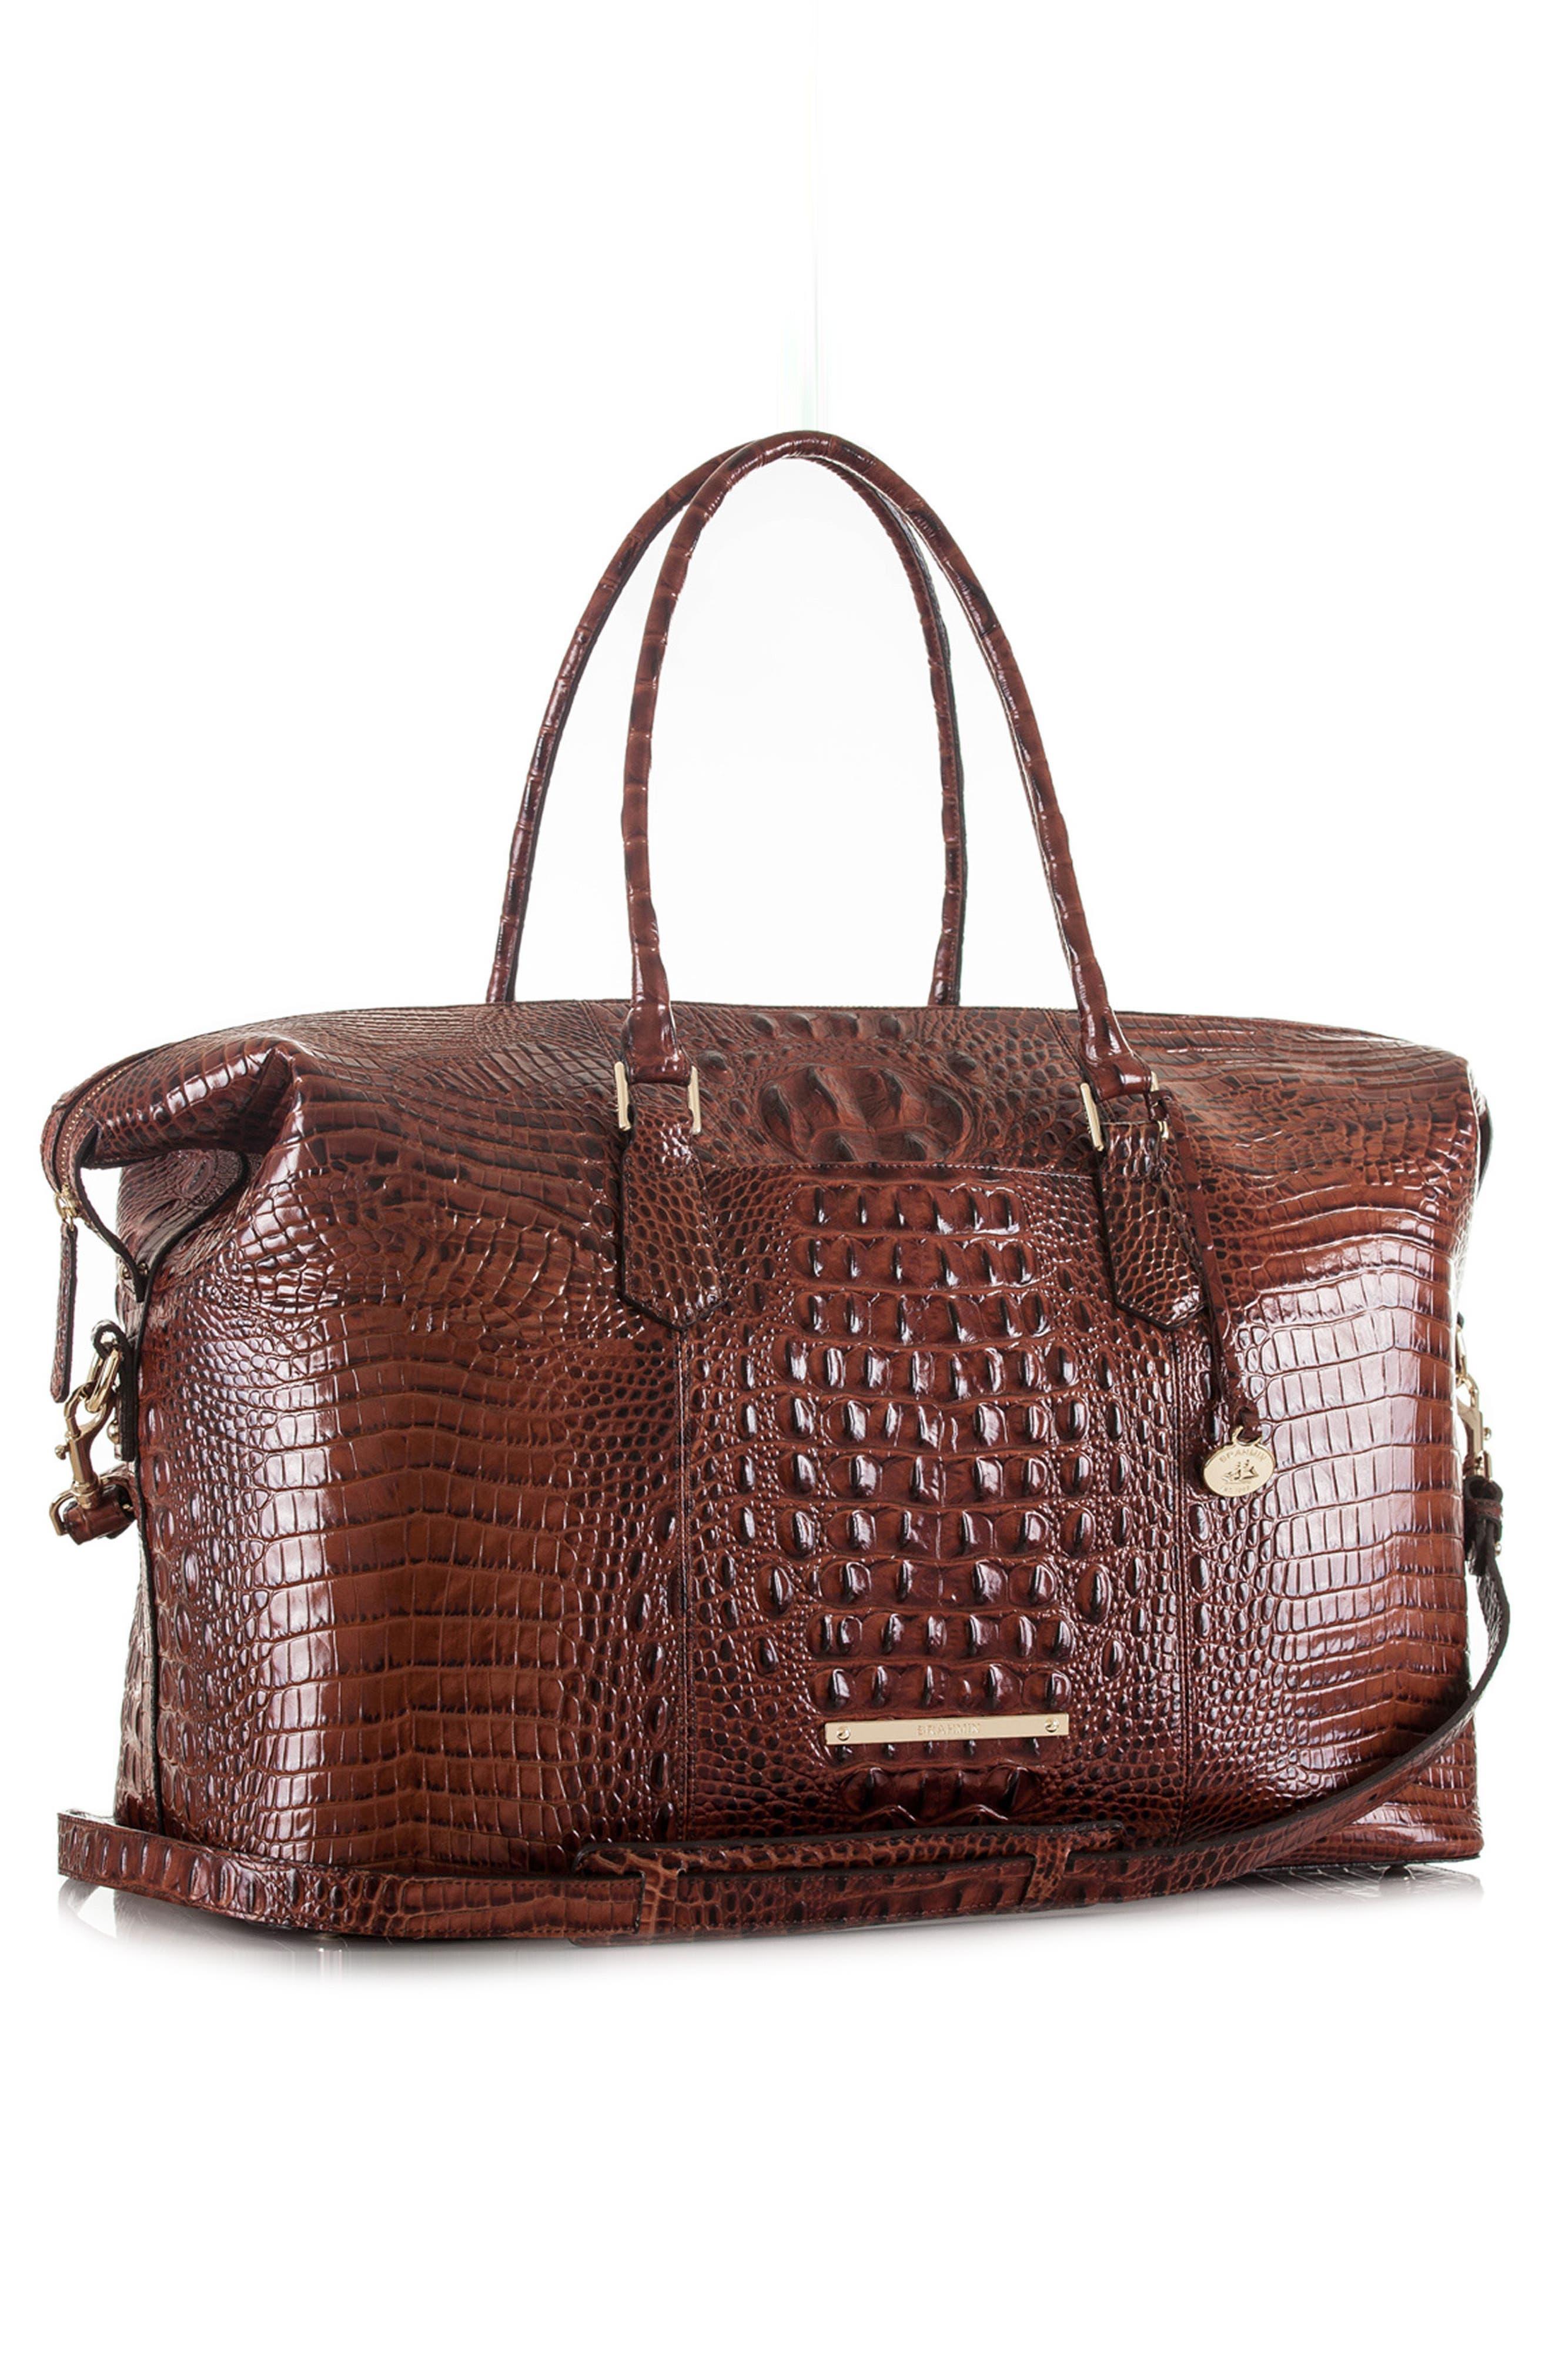 'Duxbury' Leather Travel Bag,                             Alternate thumbnail 13, color,